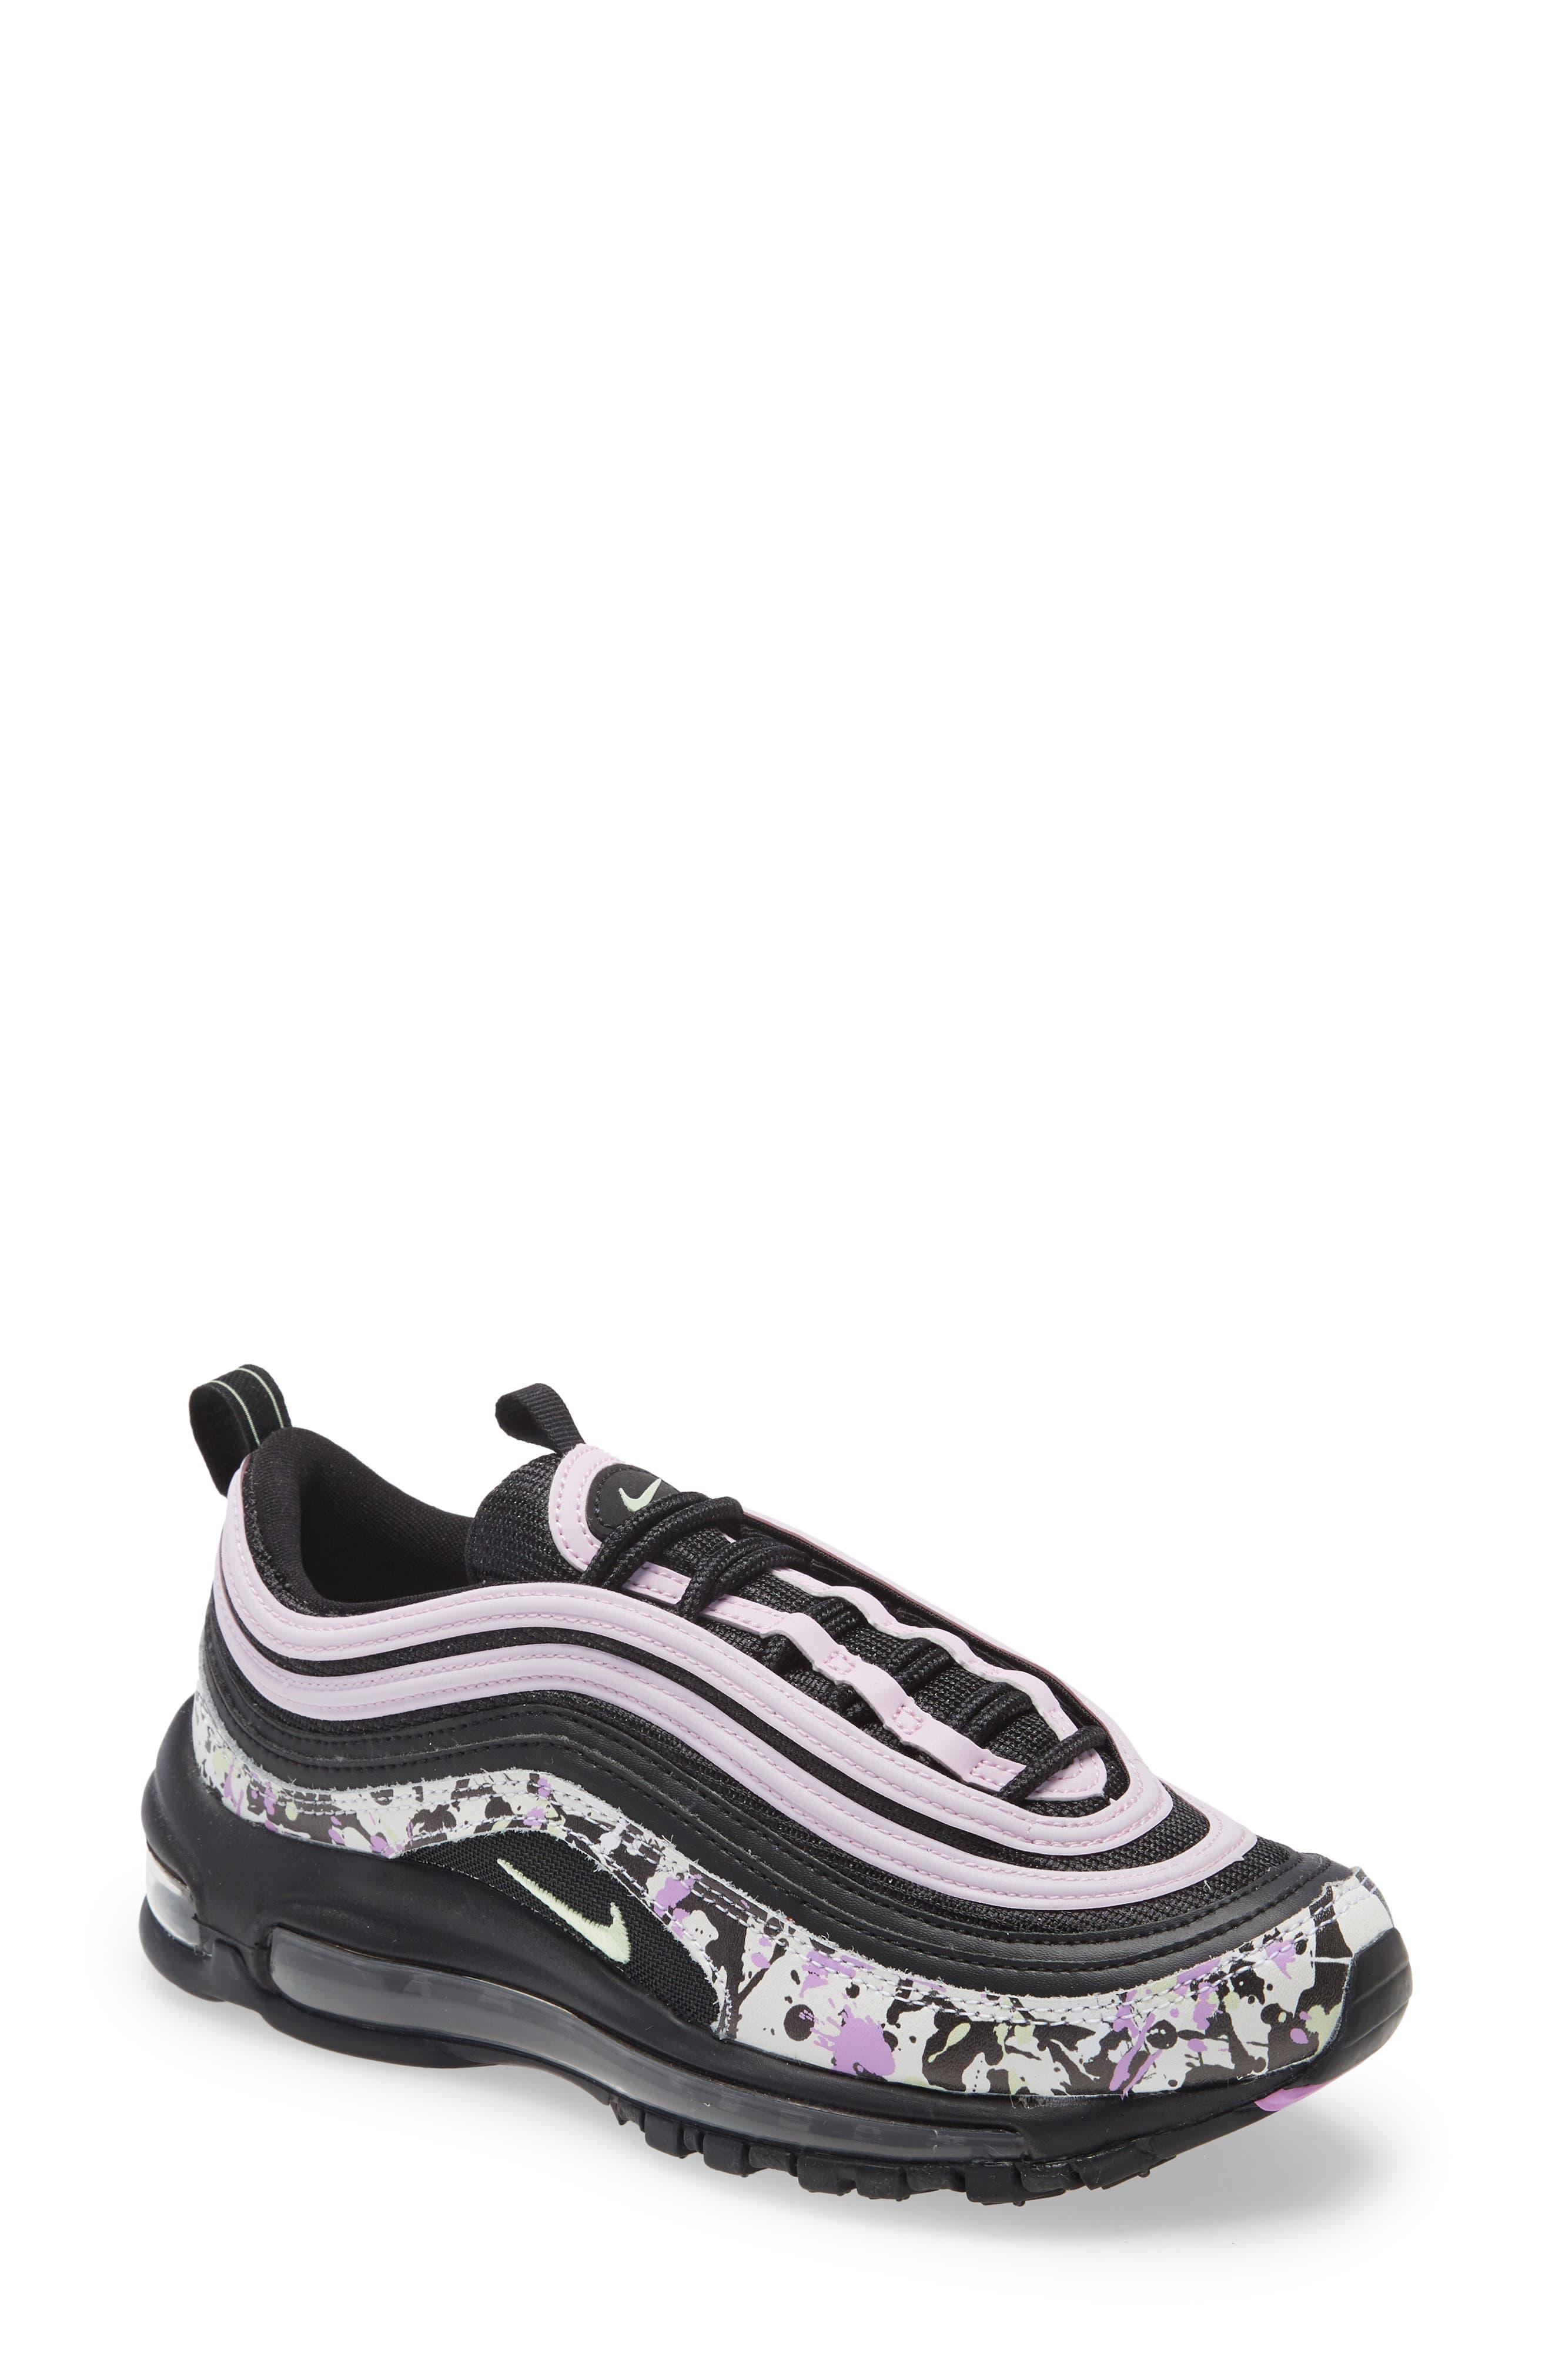 Women's Nike Air Max 97 Sneaker, Size 6 M - Black   SportSpyder